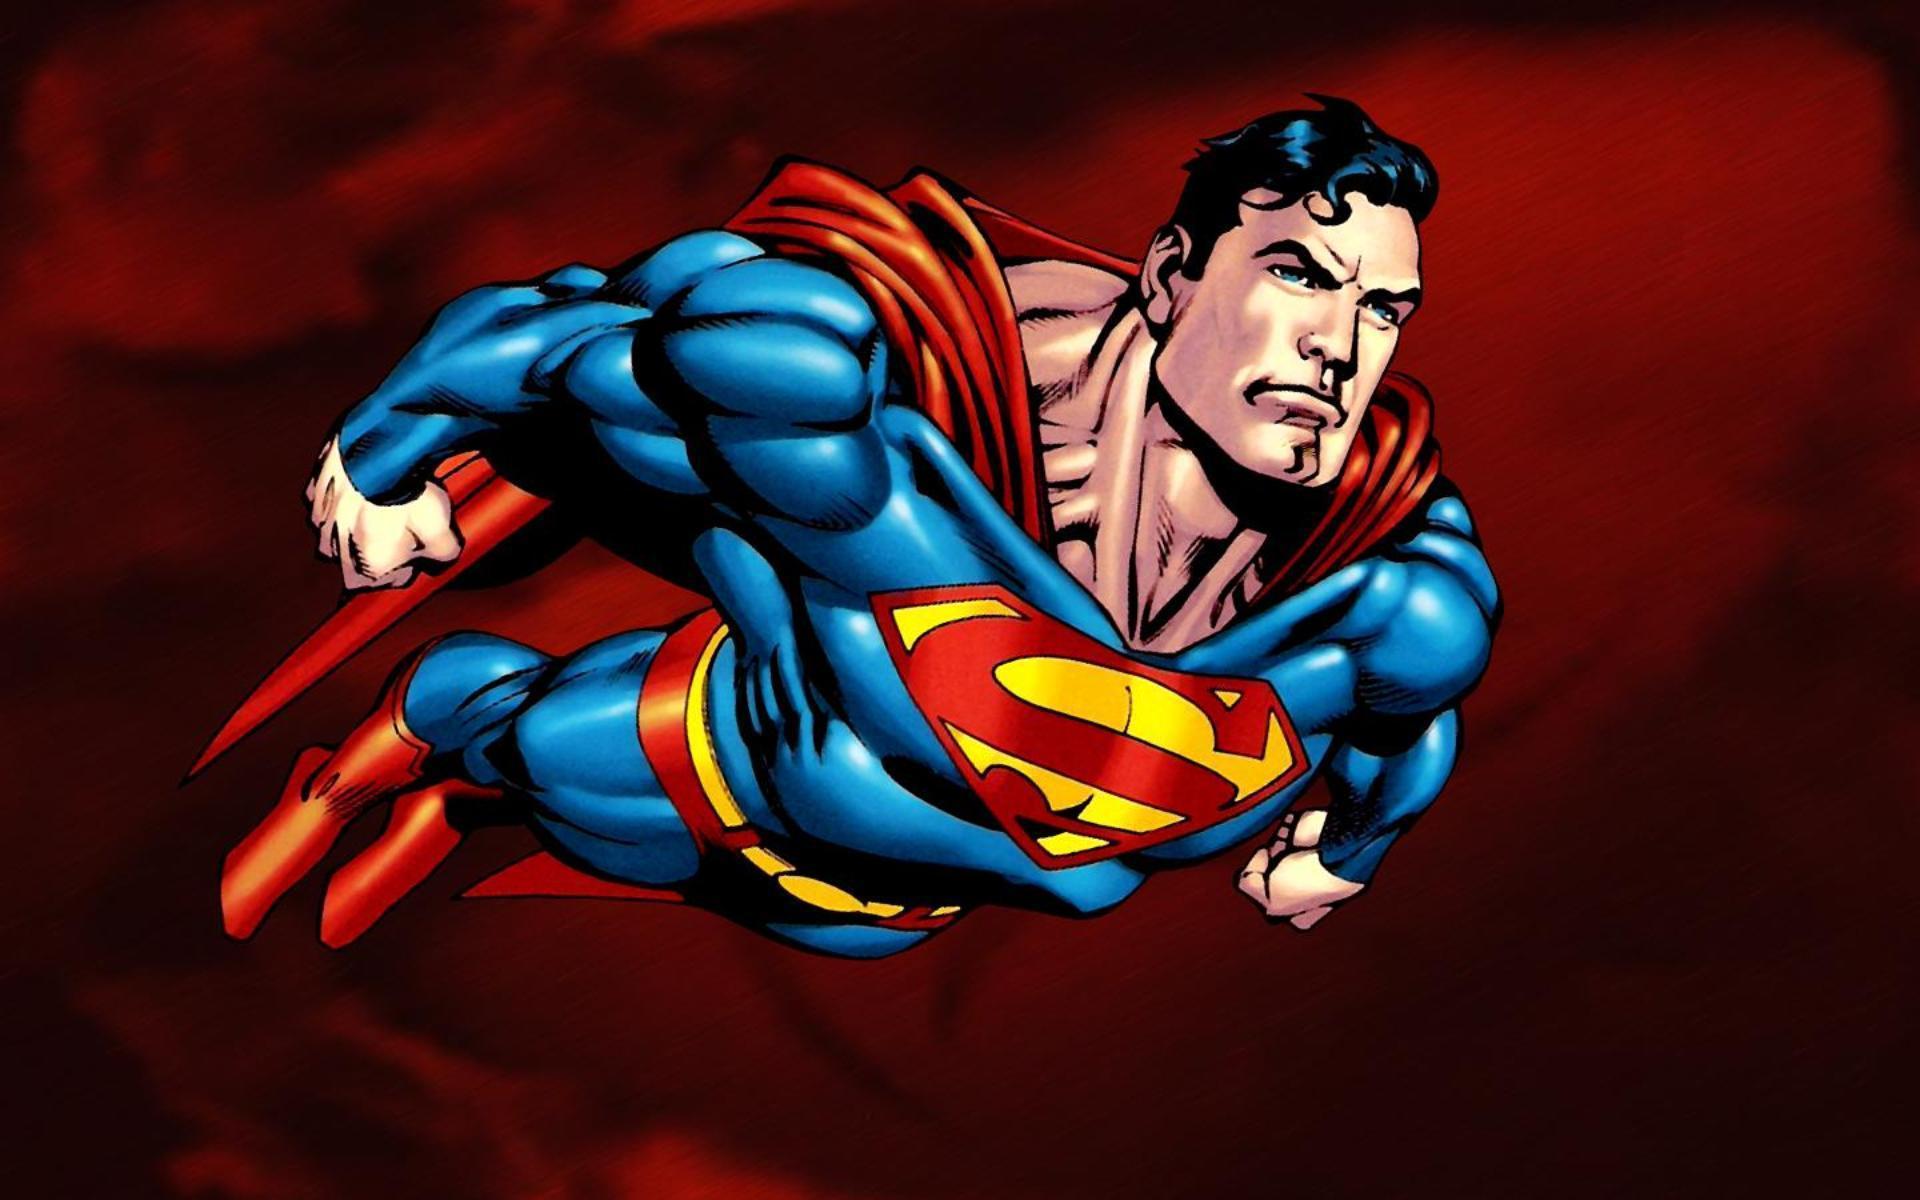 superman desktop wallpaper in - photo #5